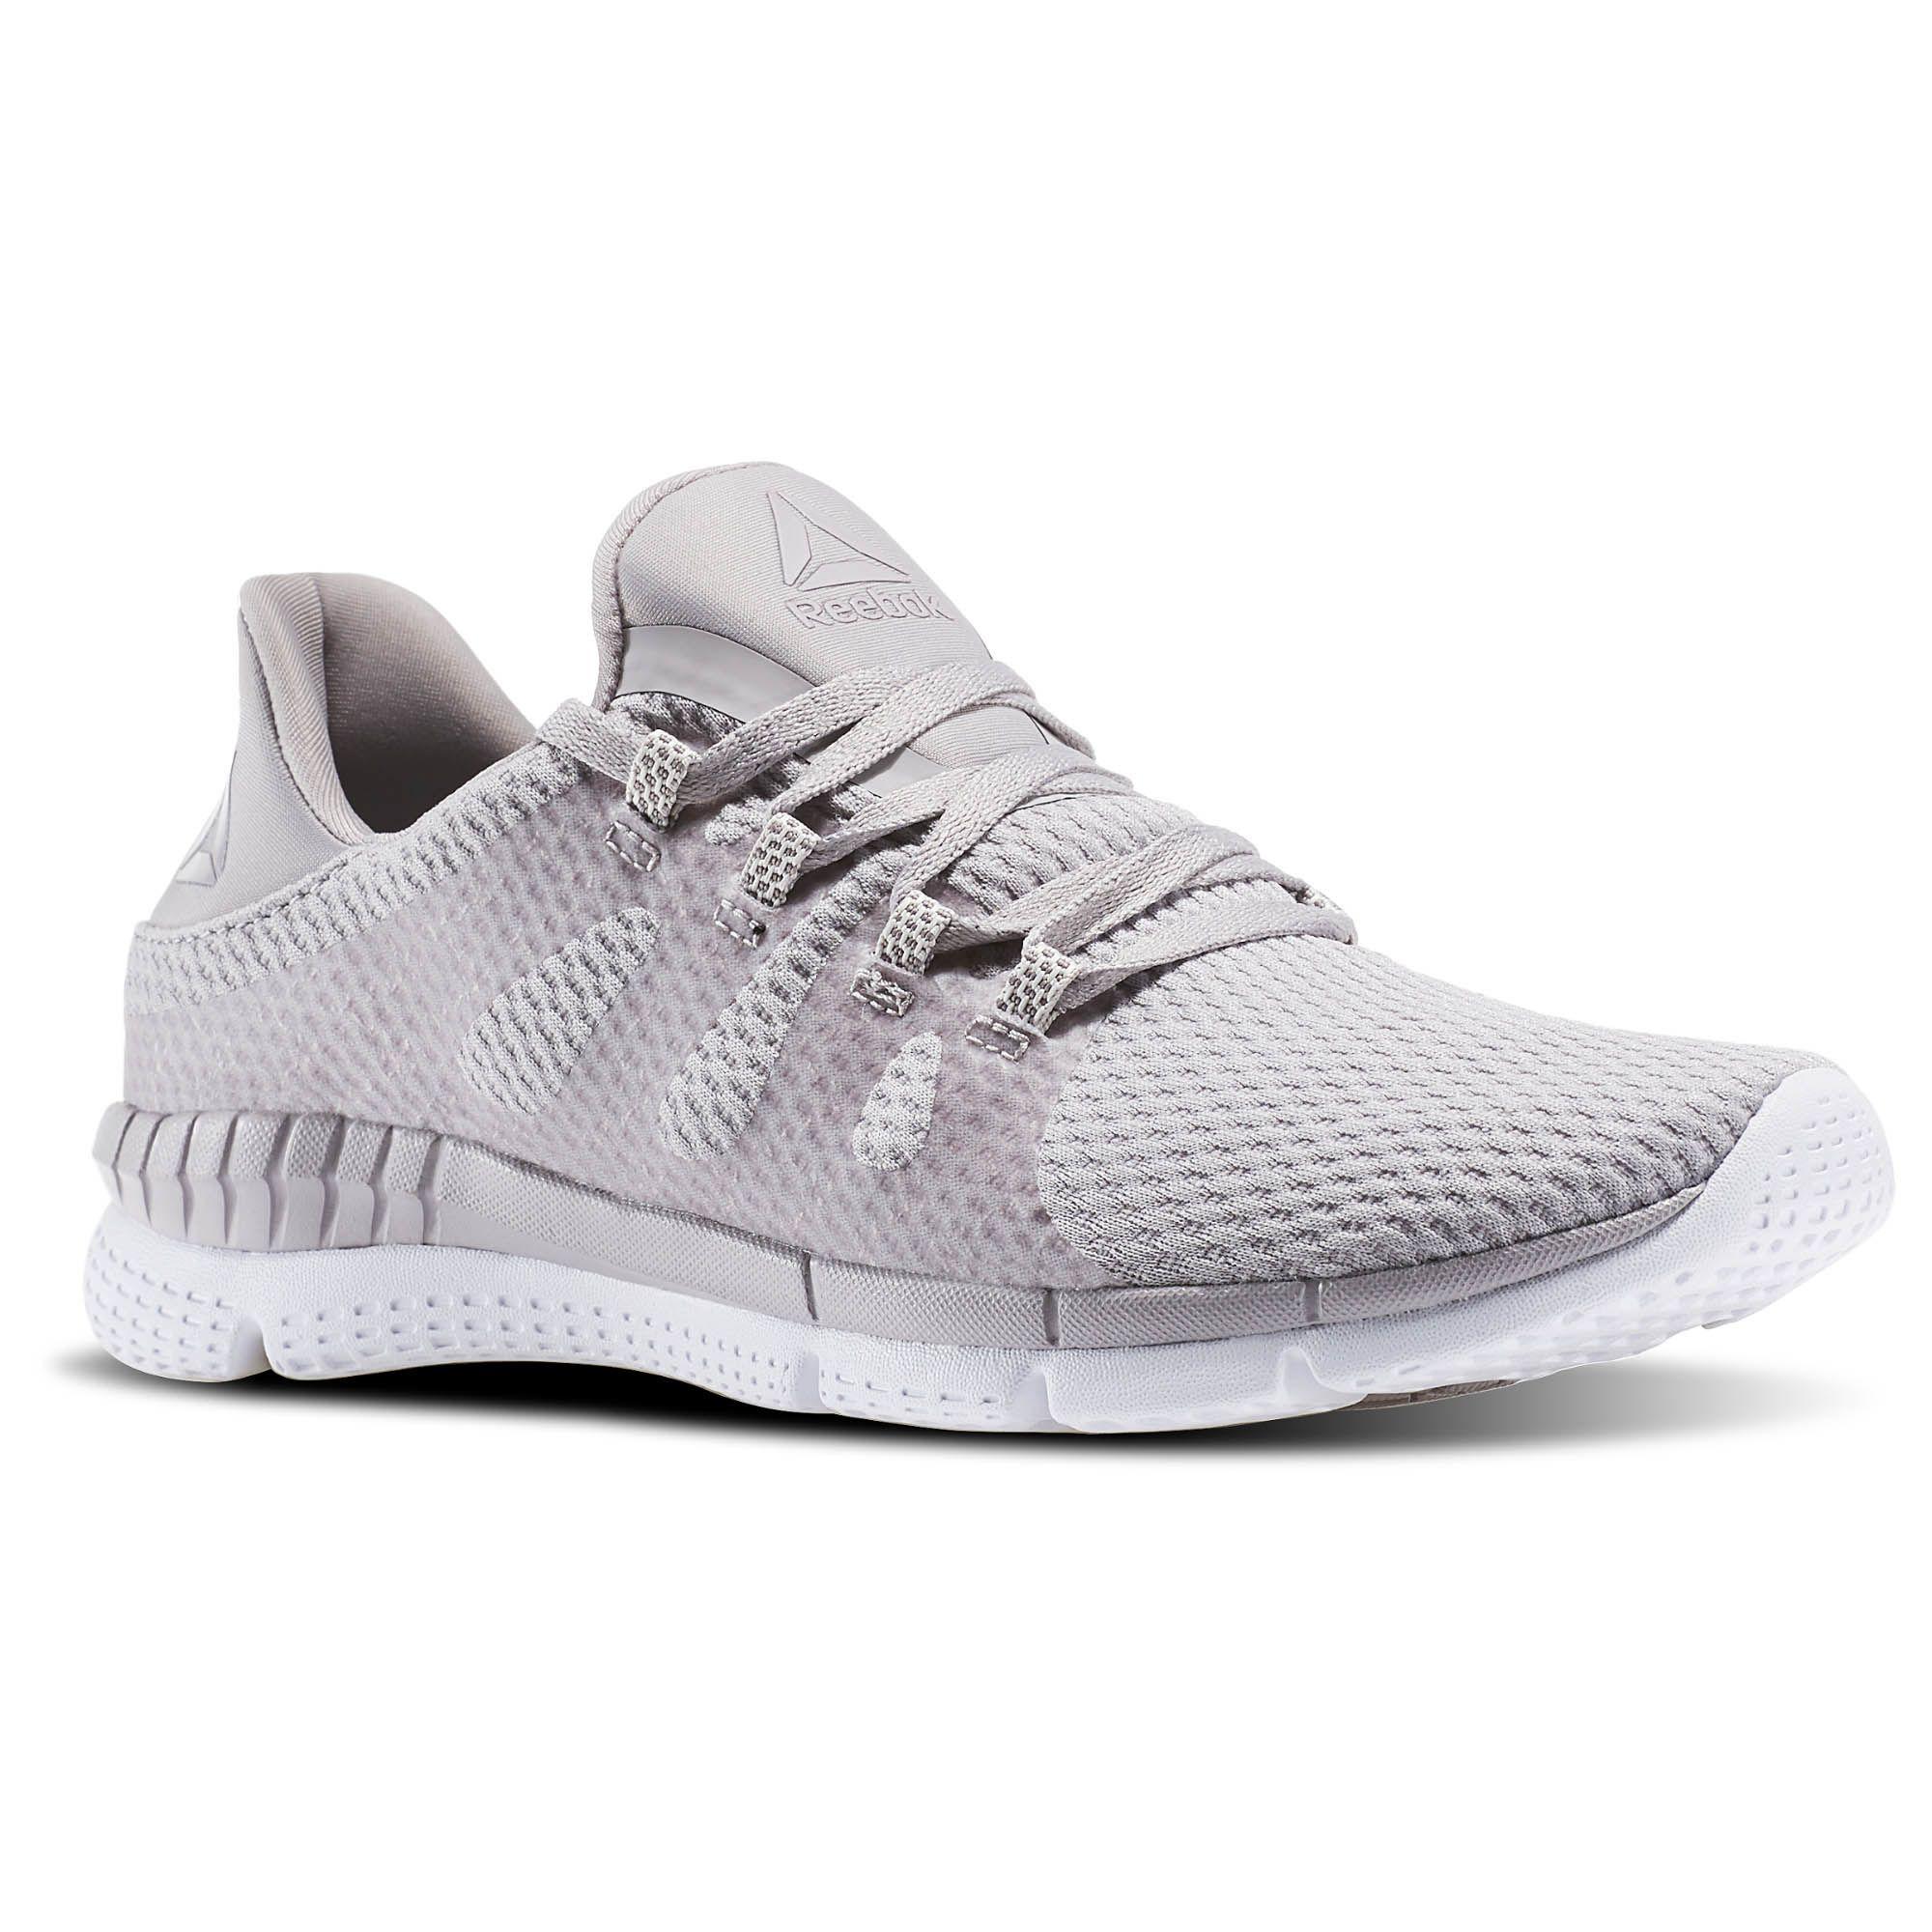 Buy reebok shoes zprint Sport Online - 54% OFF! c7ee664d5